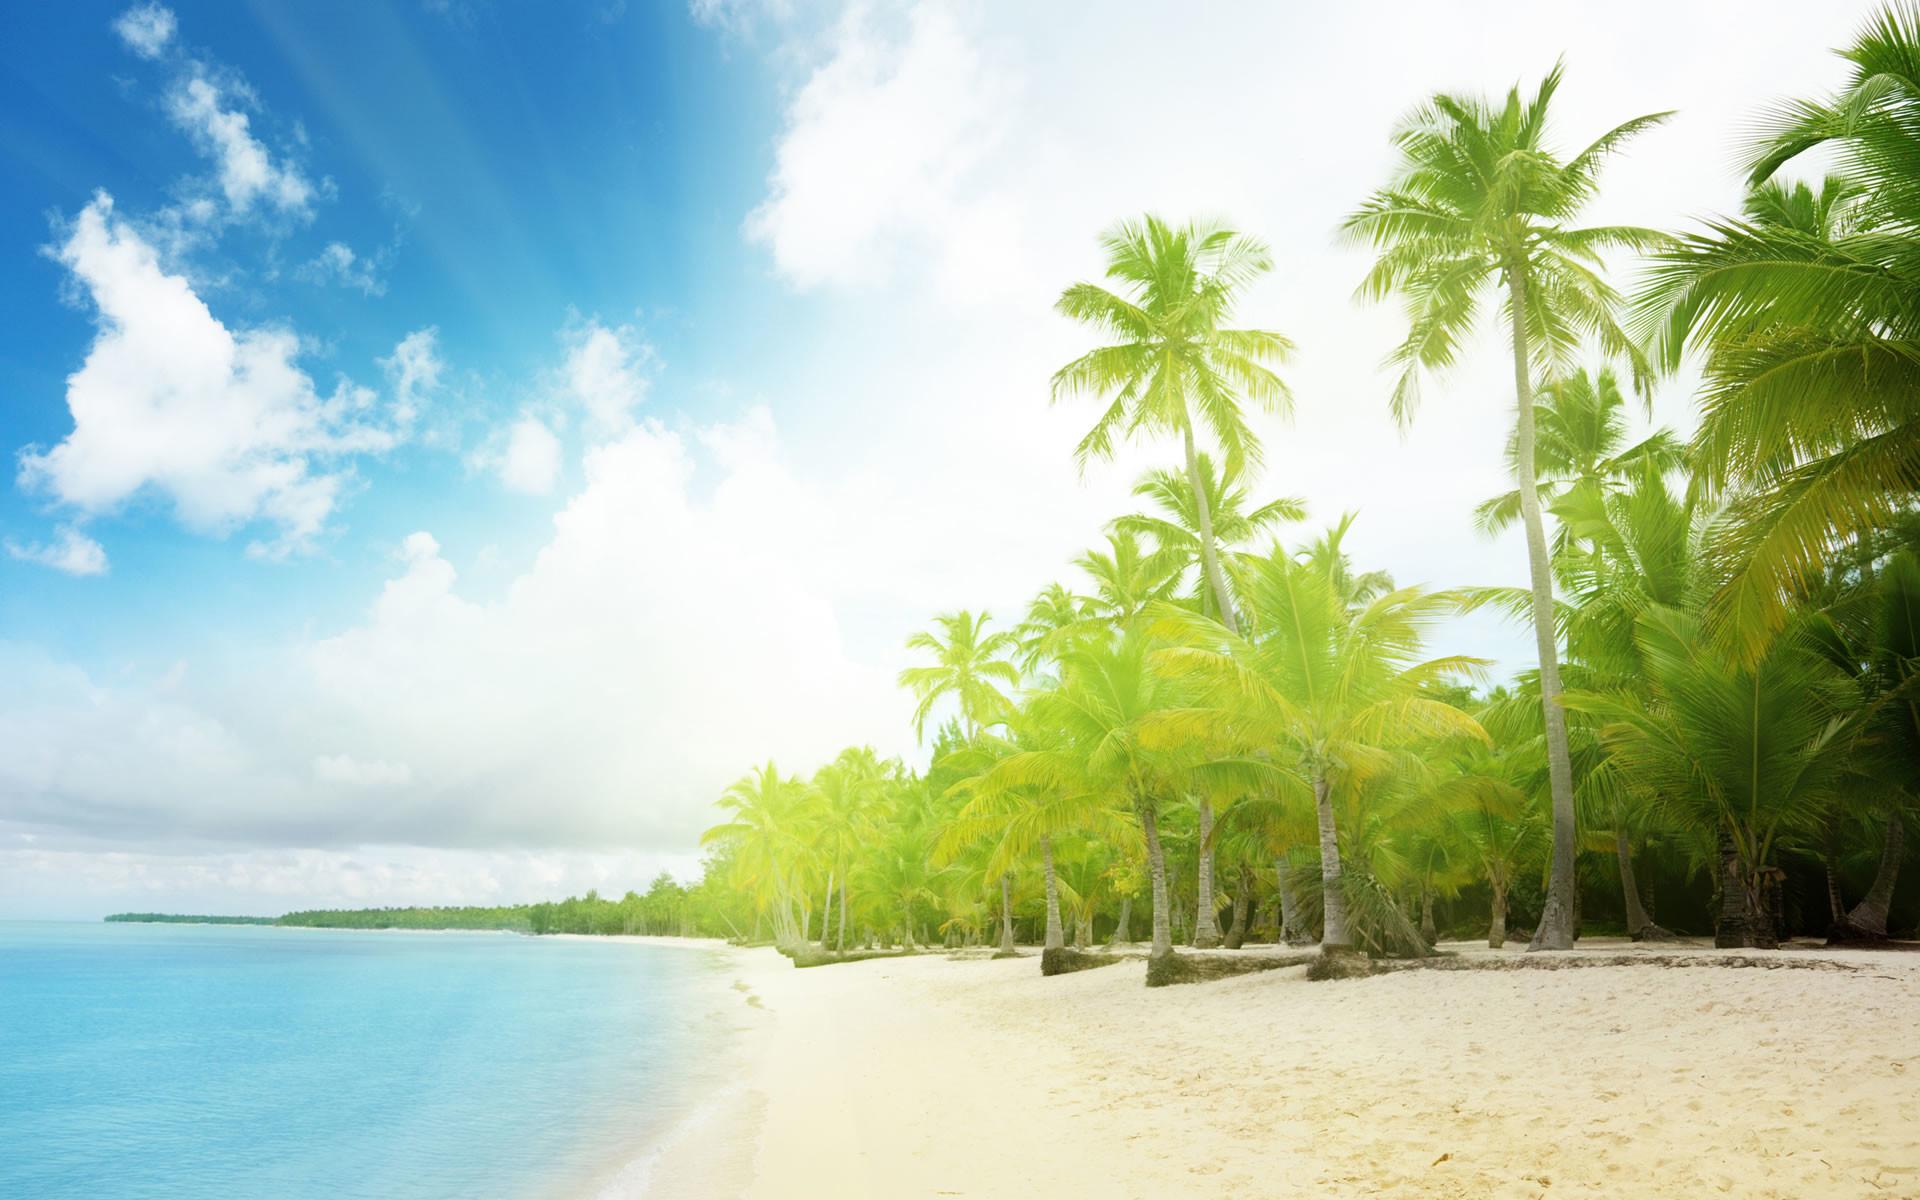 Sunny Beach Wallpaper Background